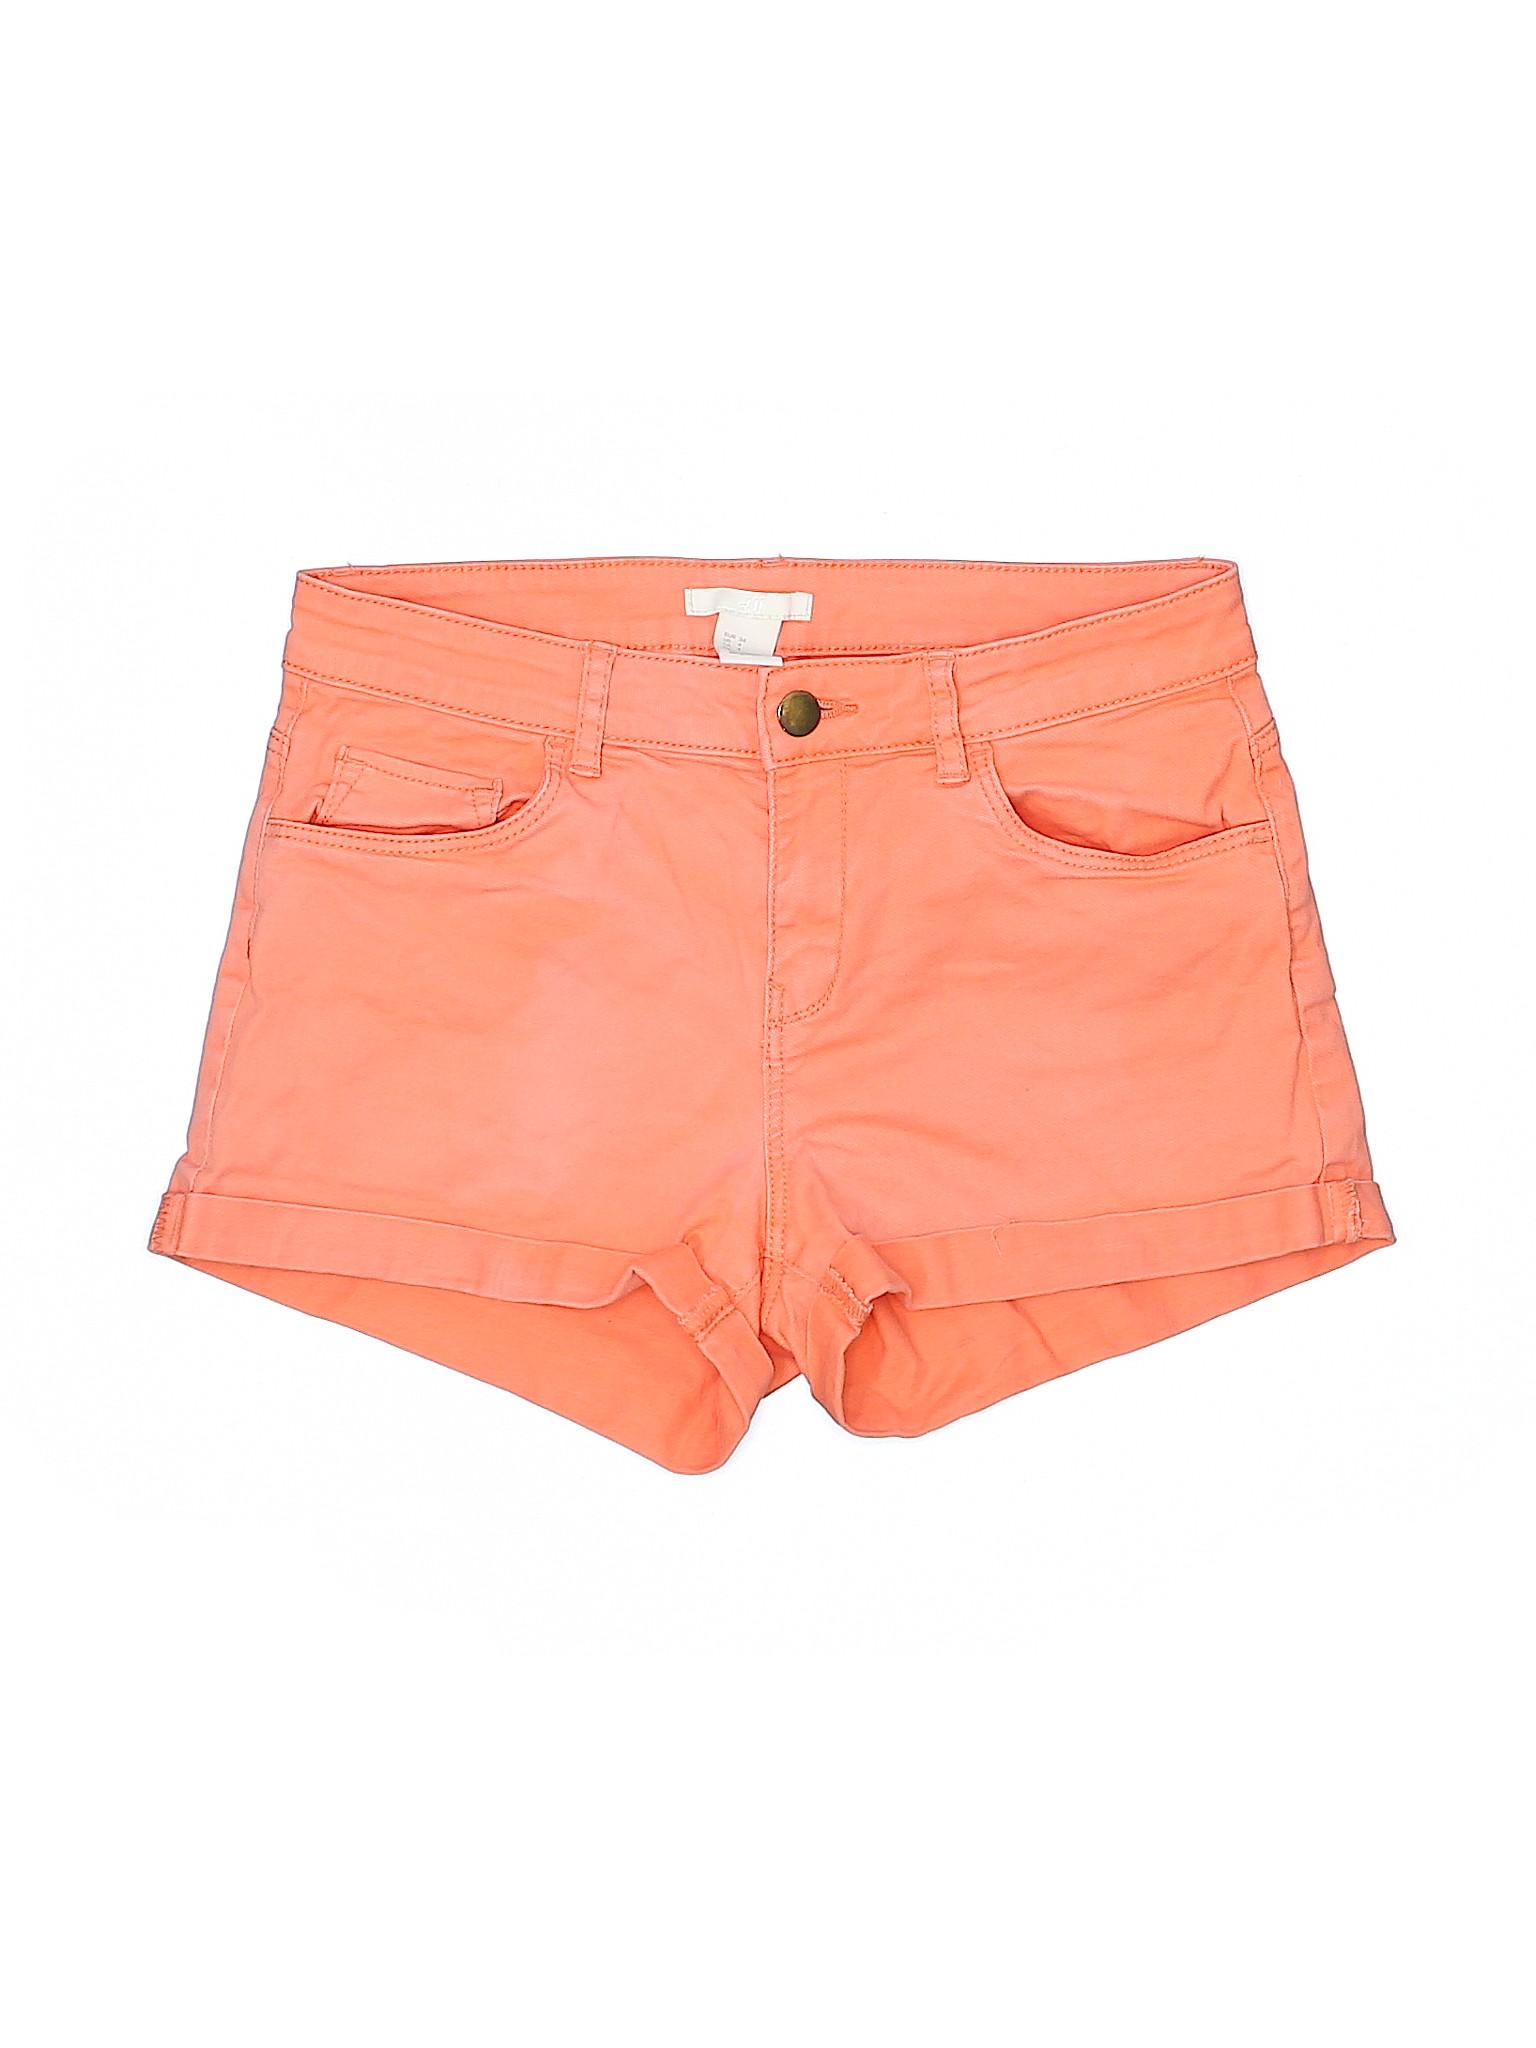 H amp;M Boutique Boutique H amp;M Denim Denim Shorts Ex4nXqIZ1w